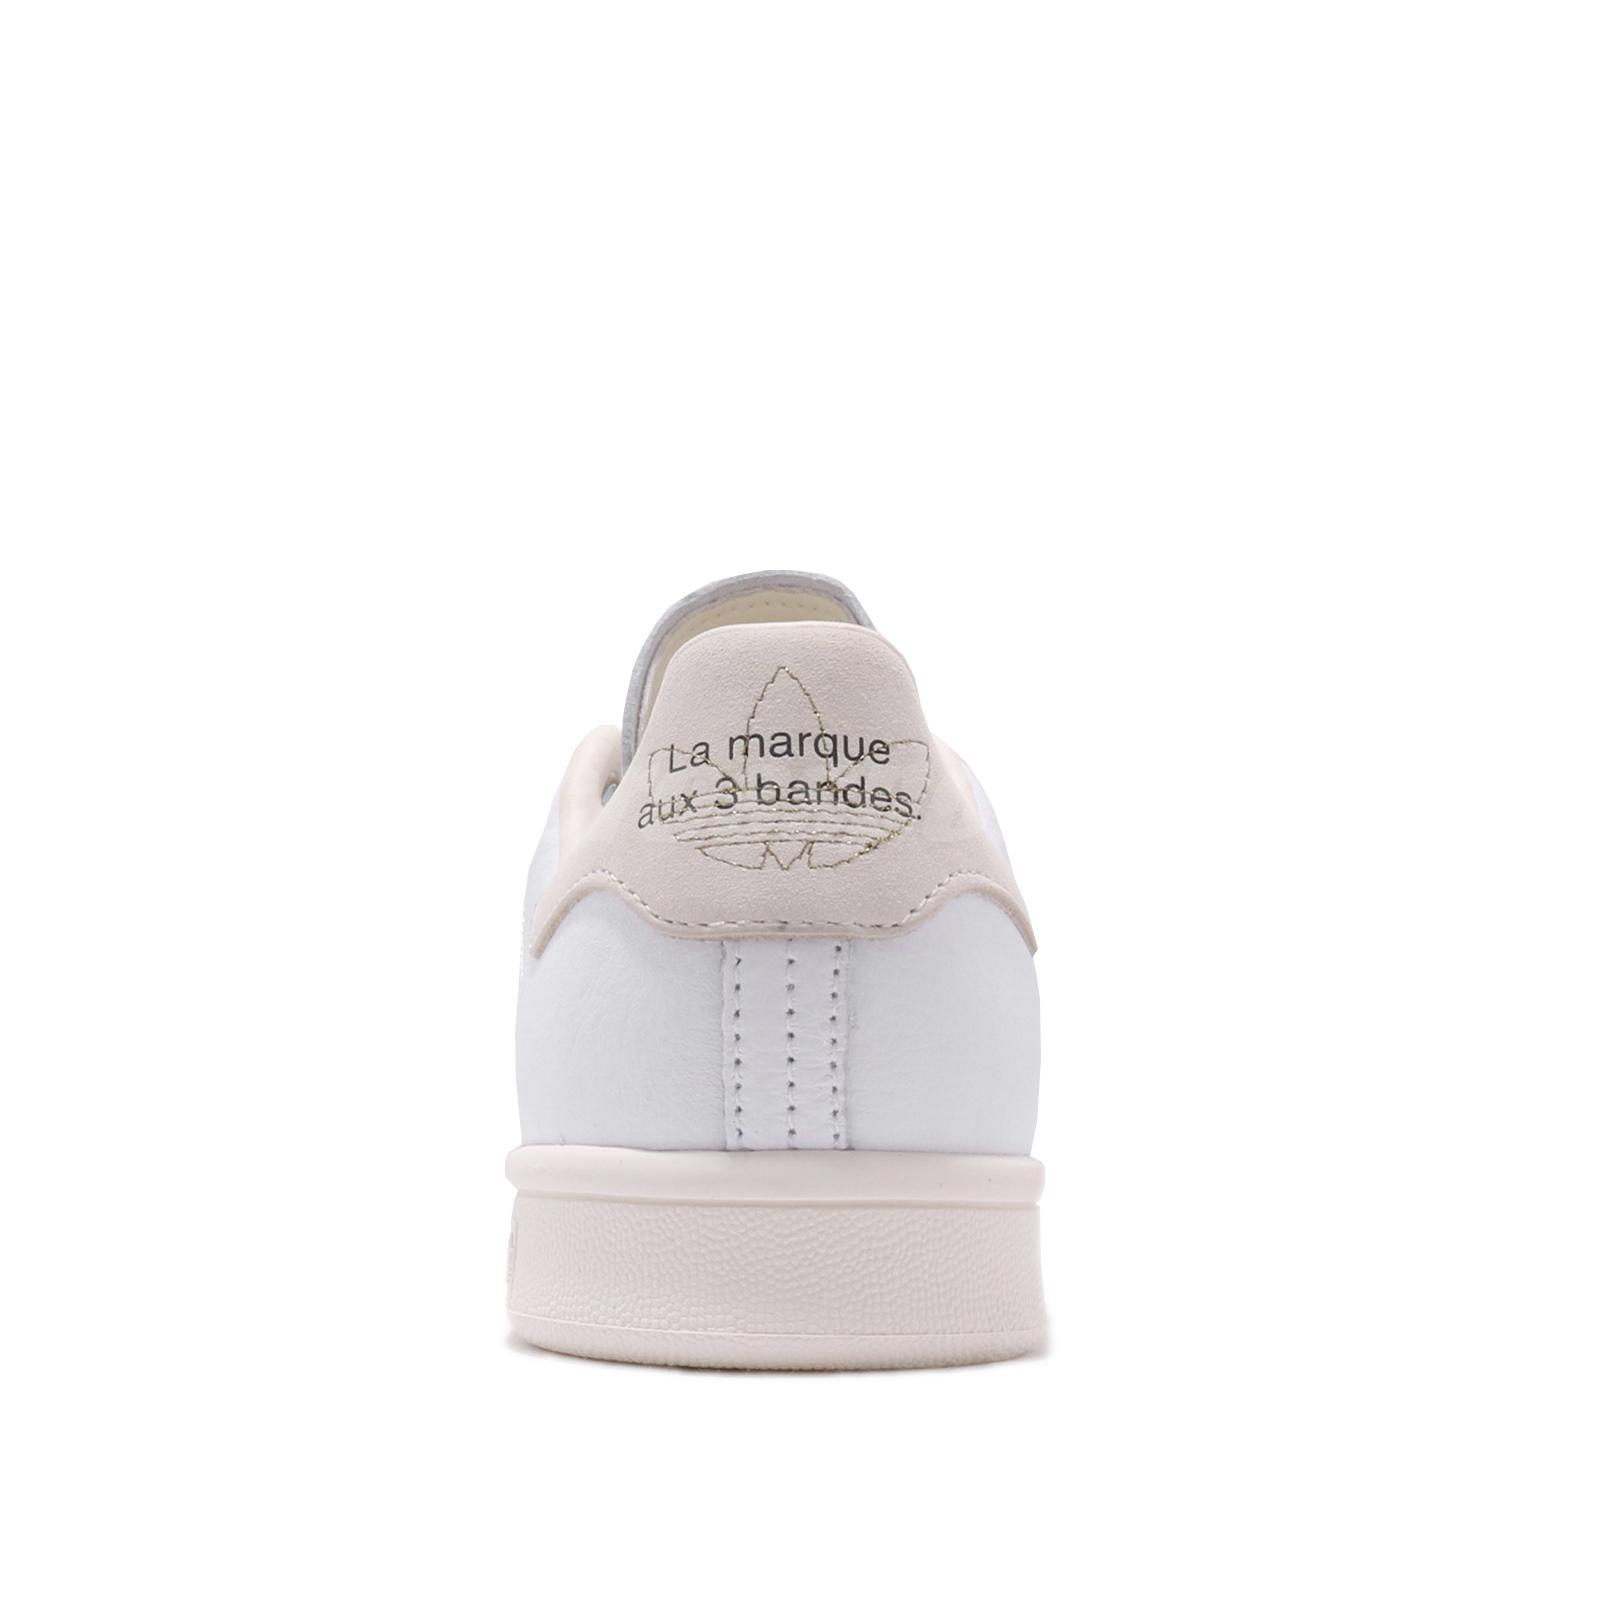 Détails sur adidas Originals Stan Smith W Off White Ivory Gold Women Casual Shoes CG6820